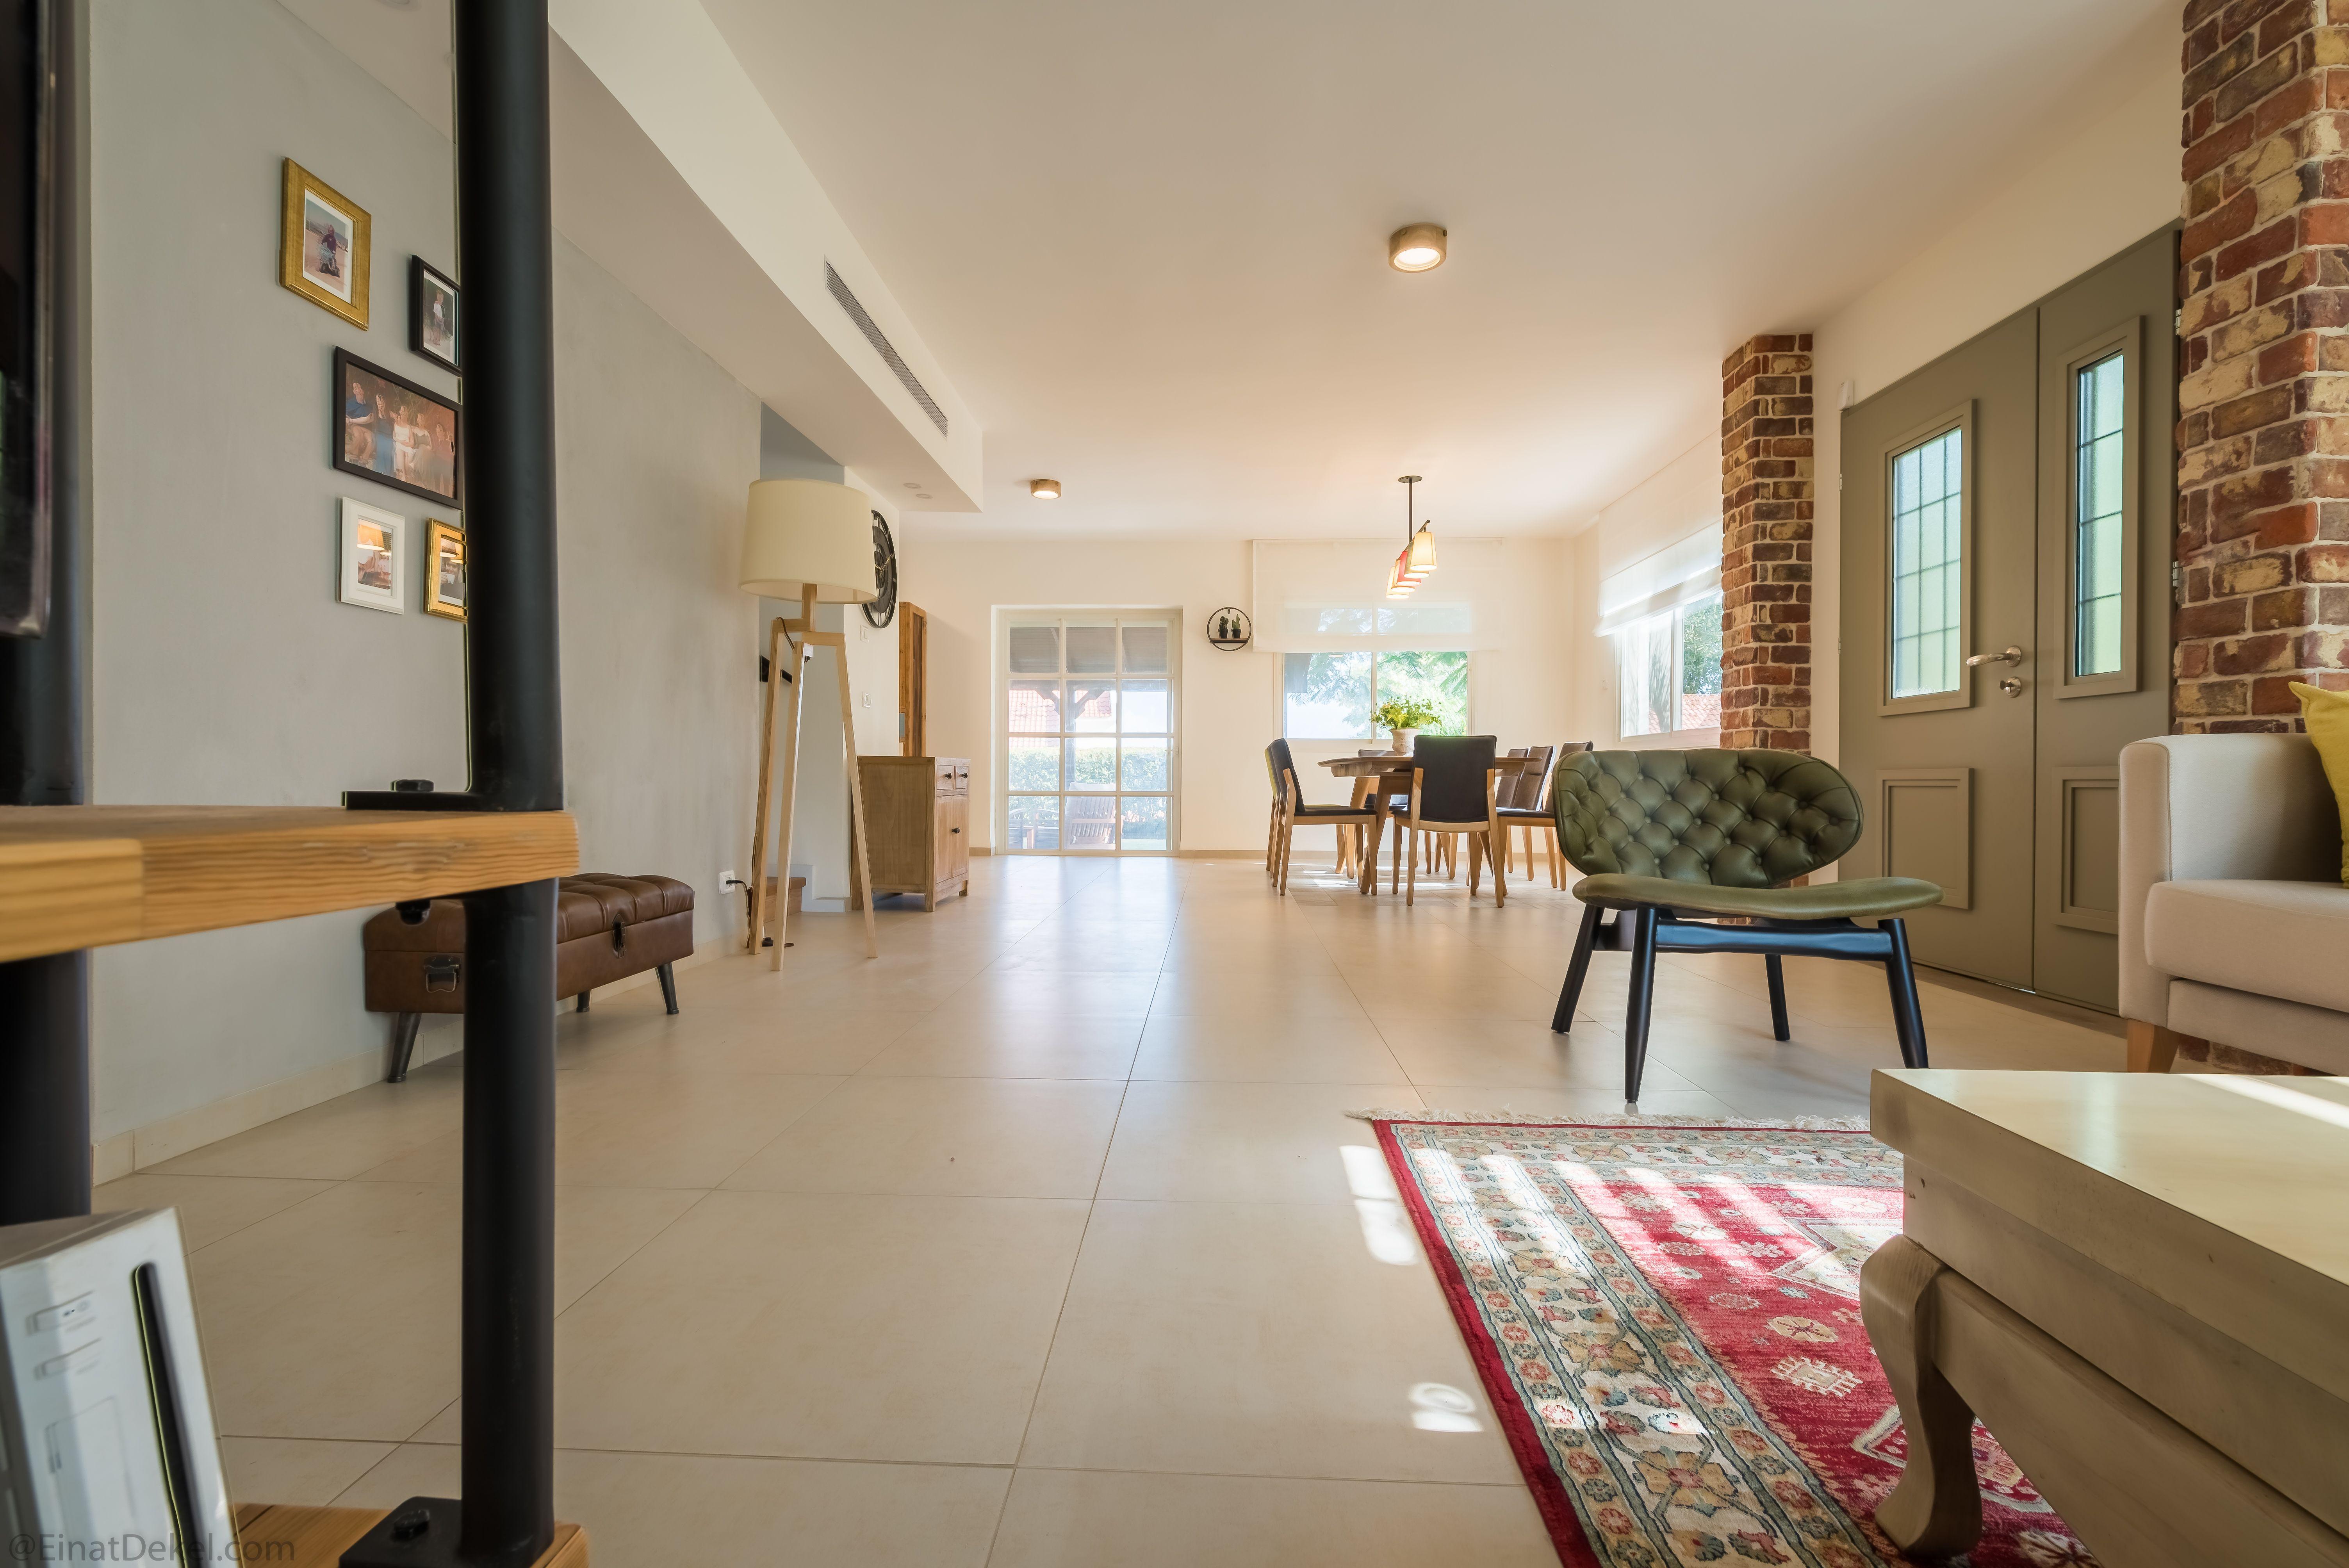 Haus außentor design project in gan ner israel designer adi zilberberg  my design